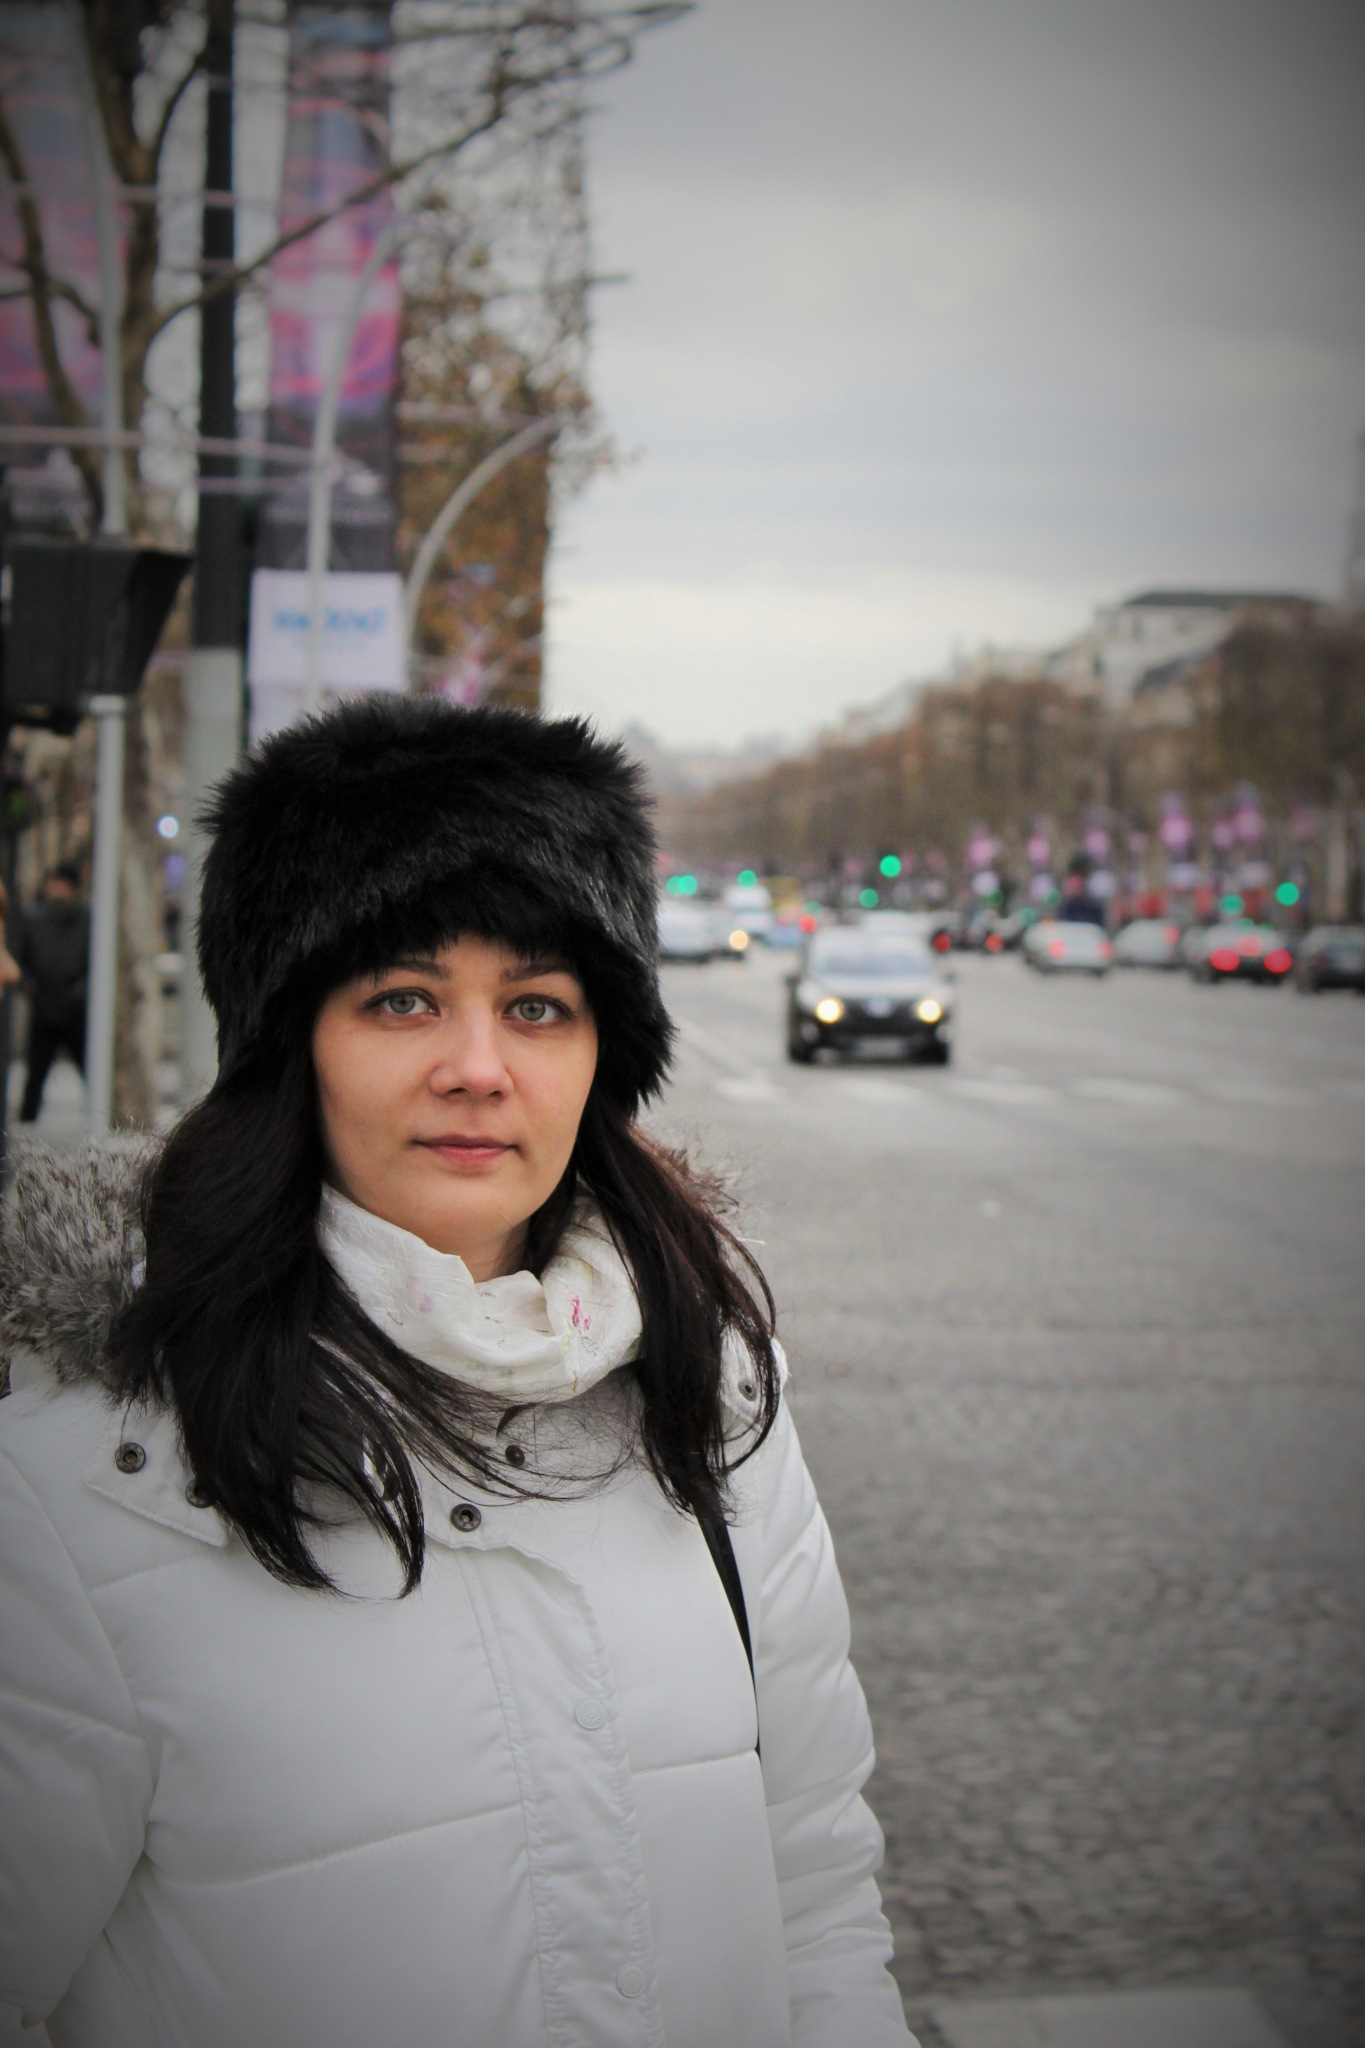 Champs Elysee by Bogdan Ciobanu